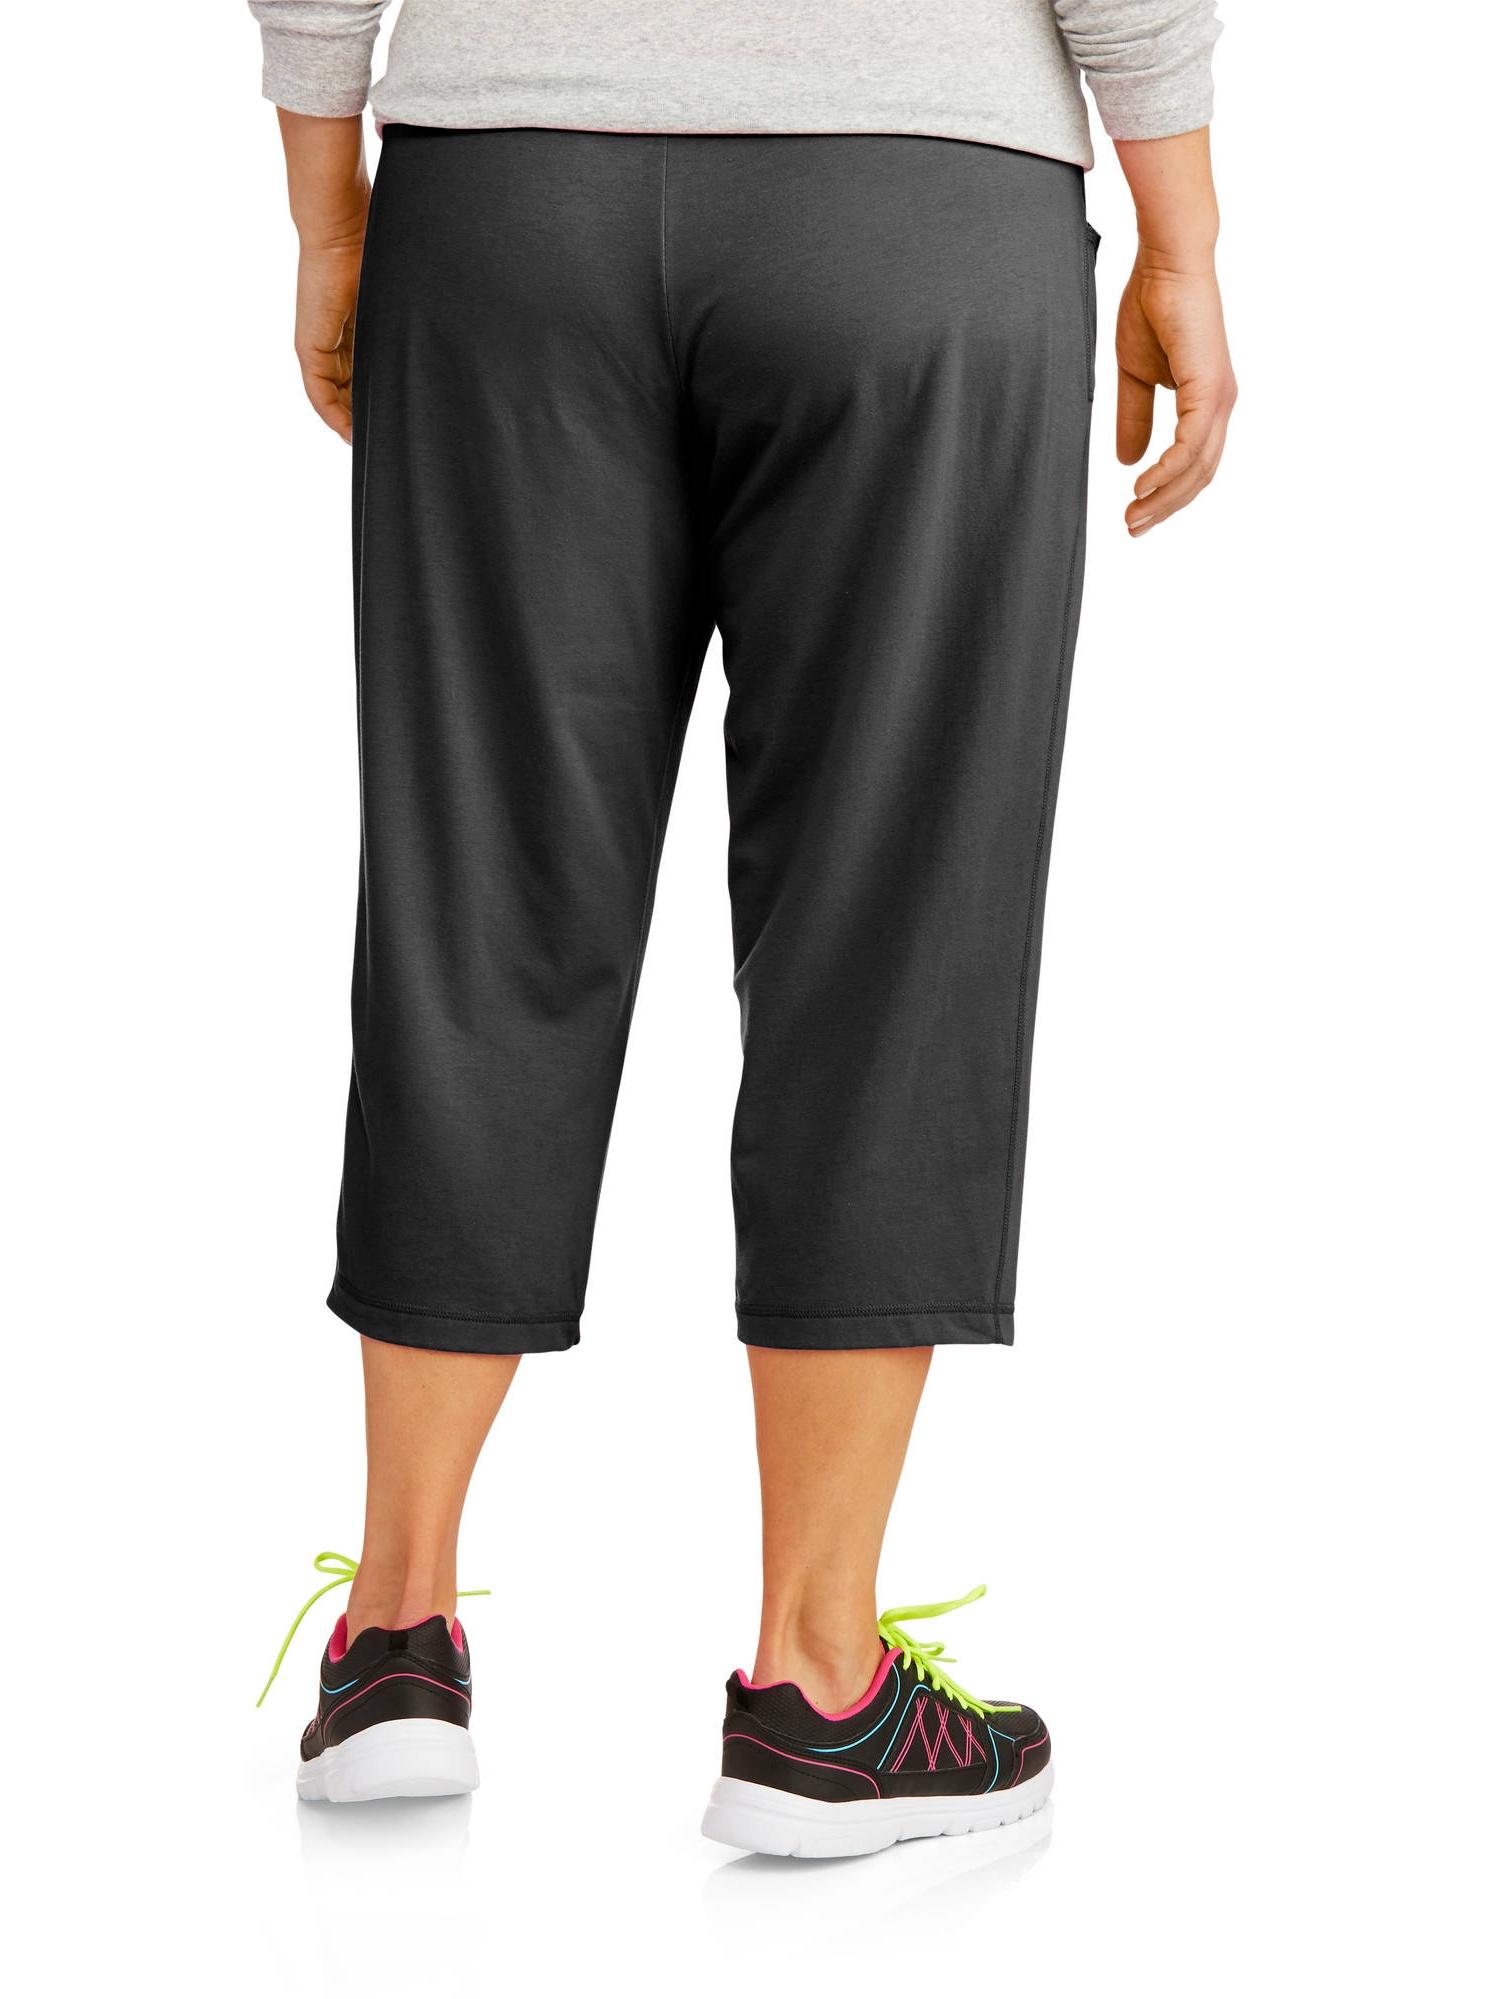 e5f8ca4bc27 Danskin Now - Danskin Now Women s Plus-Size Essential Knit Capris with  Drawstring - Walmart.com